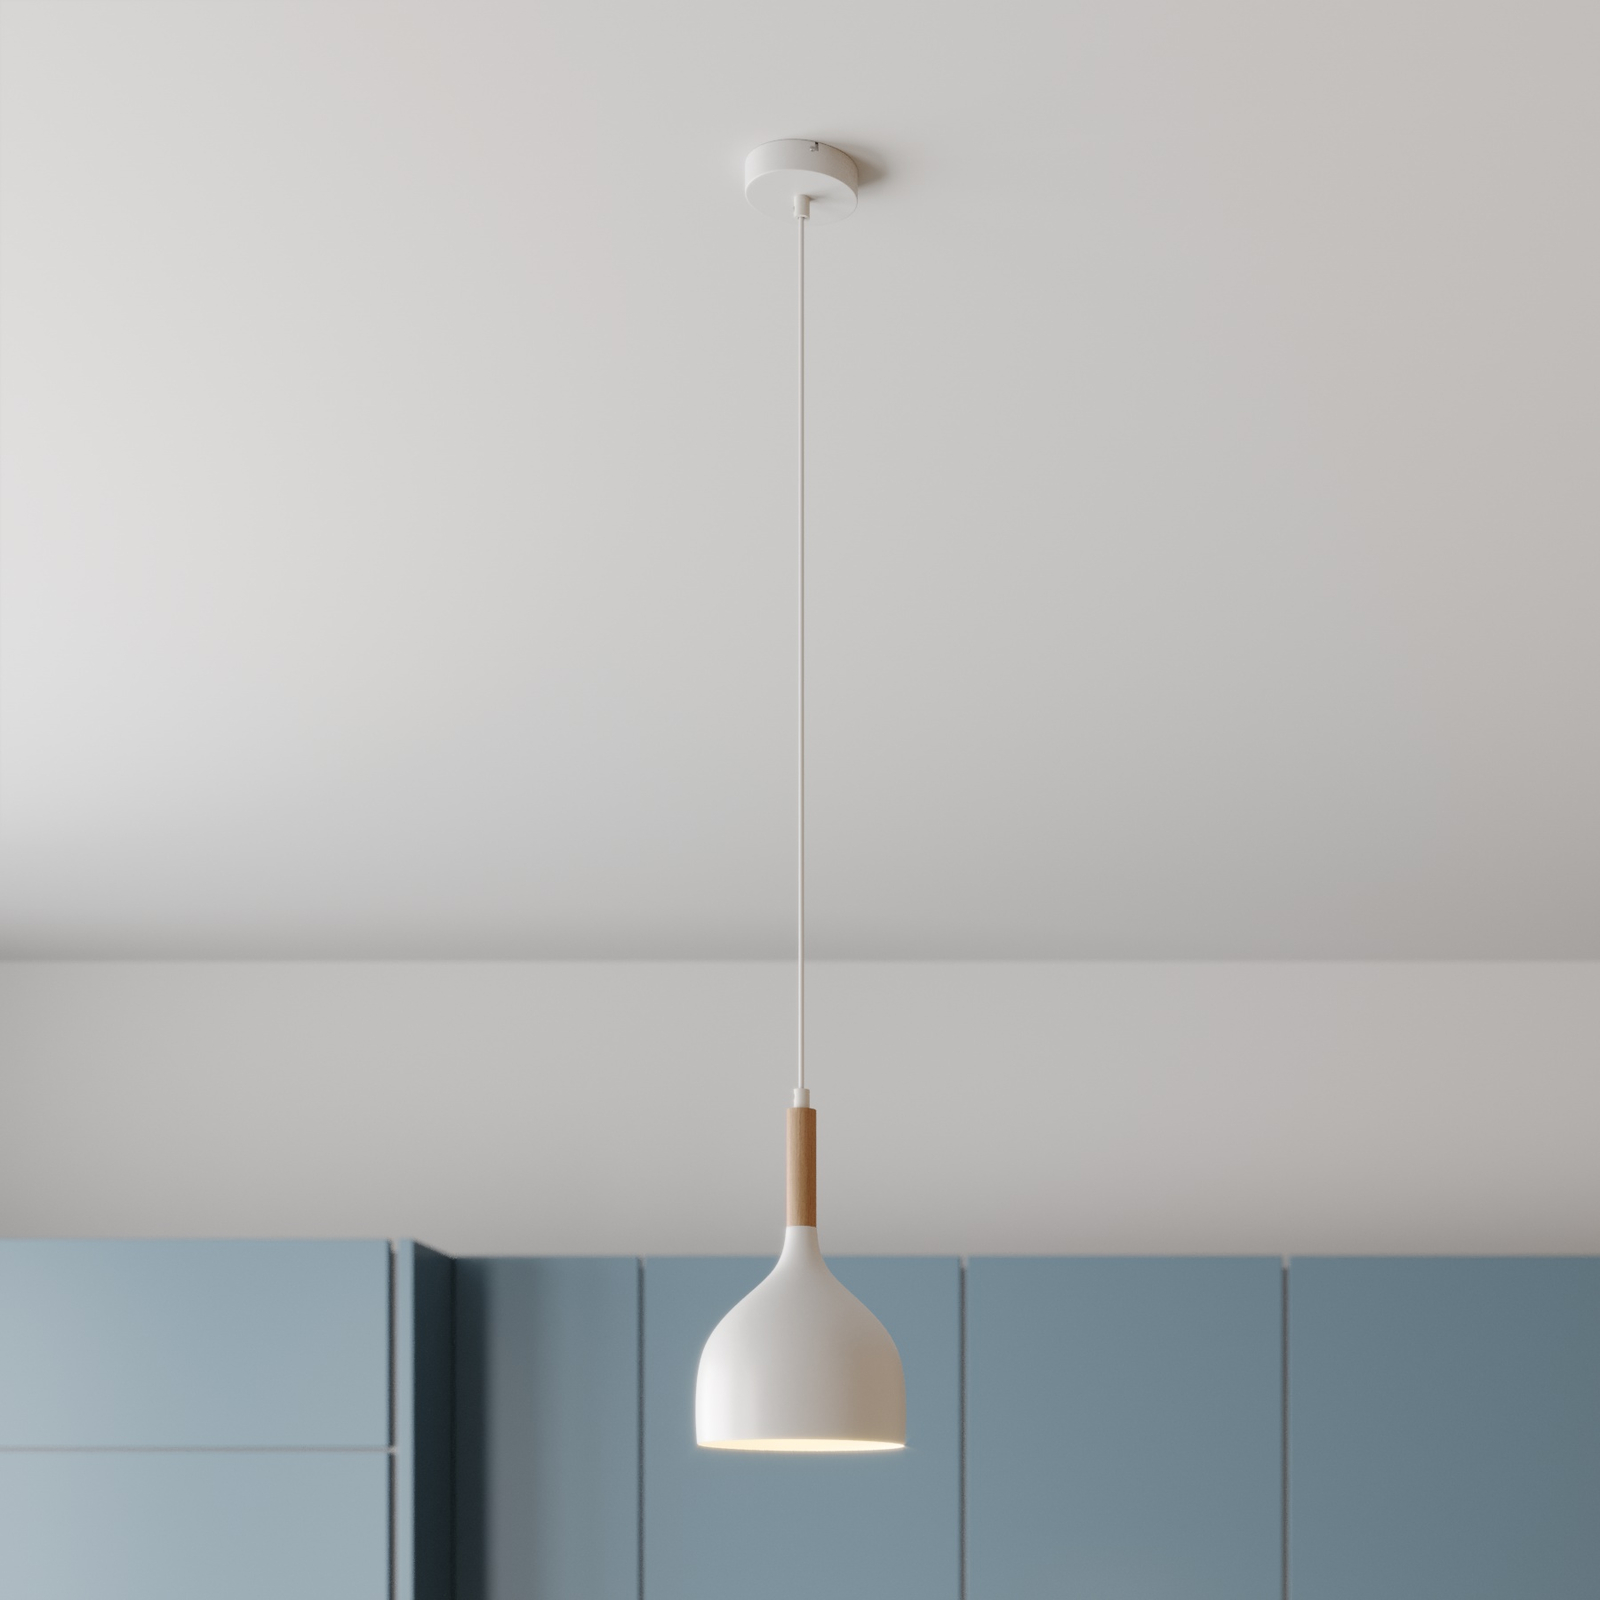 Hanglamp Noak, 1-lamp, wit/hout natuur